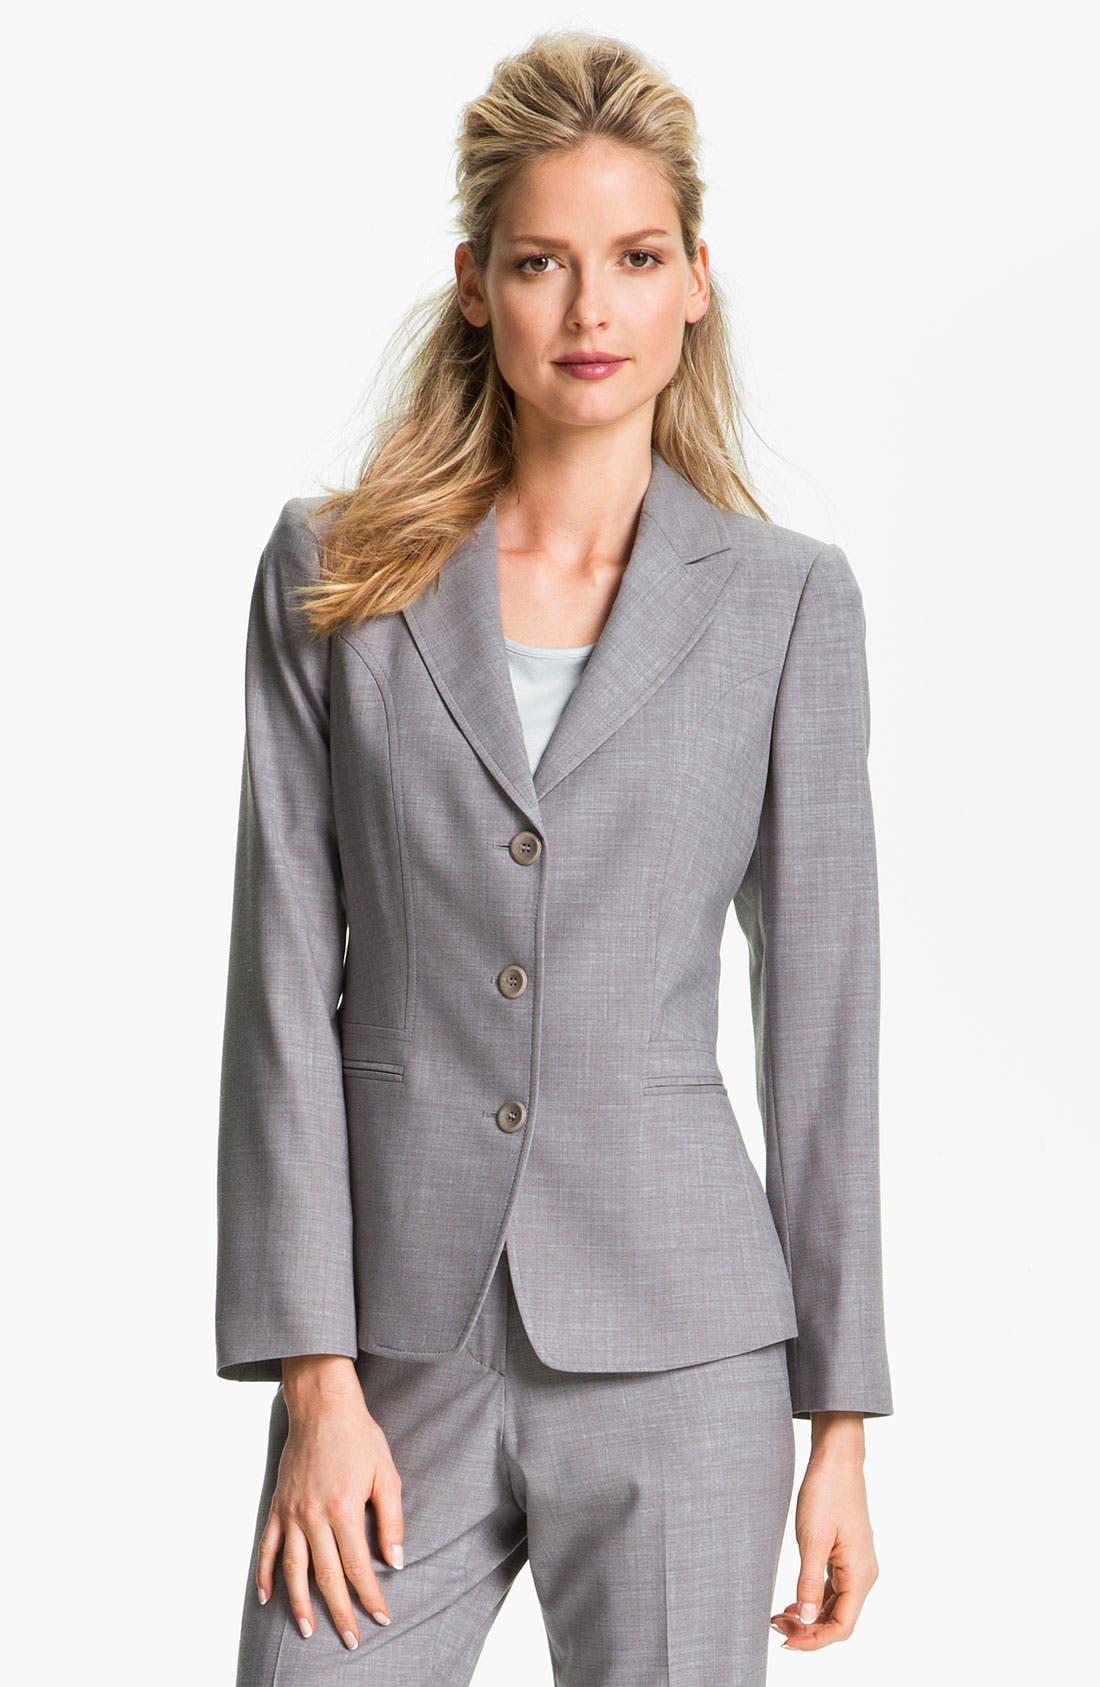 Alternate Image 1 Selected - Santorelli 'Elena' Jacket